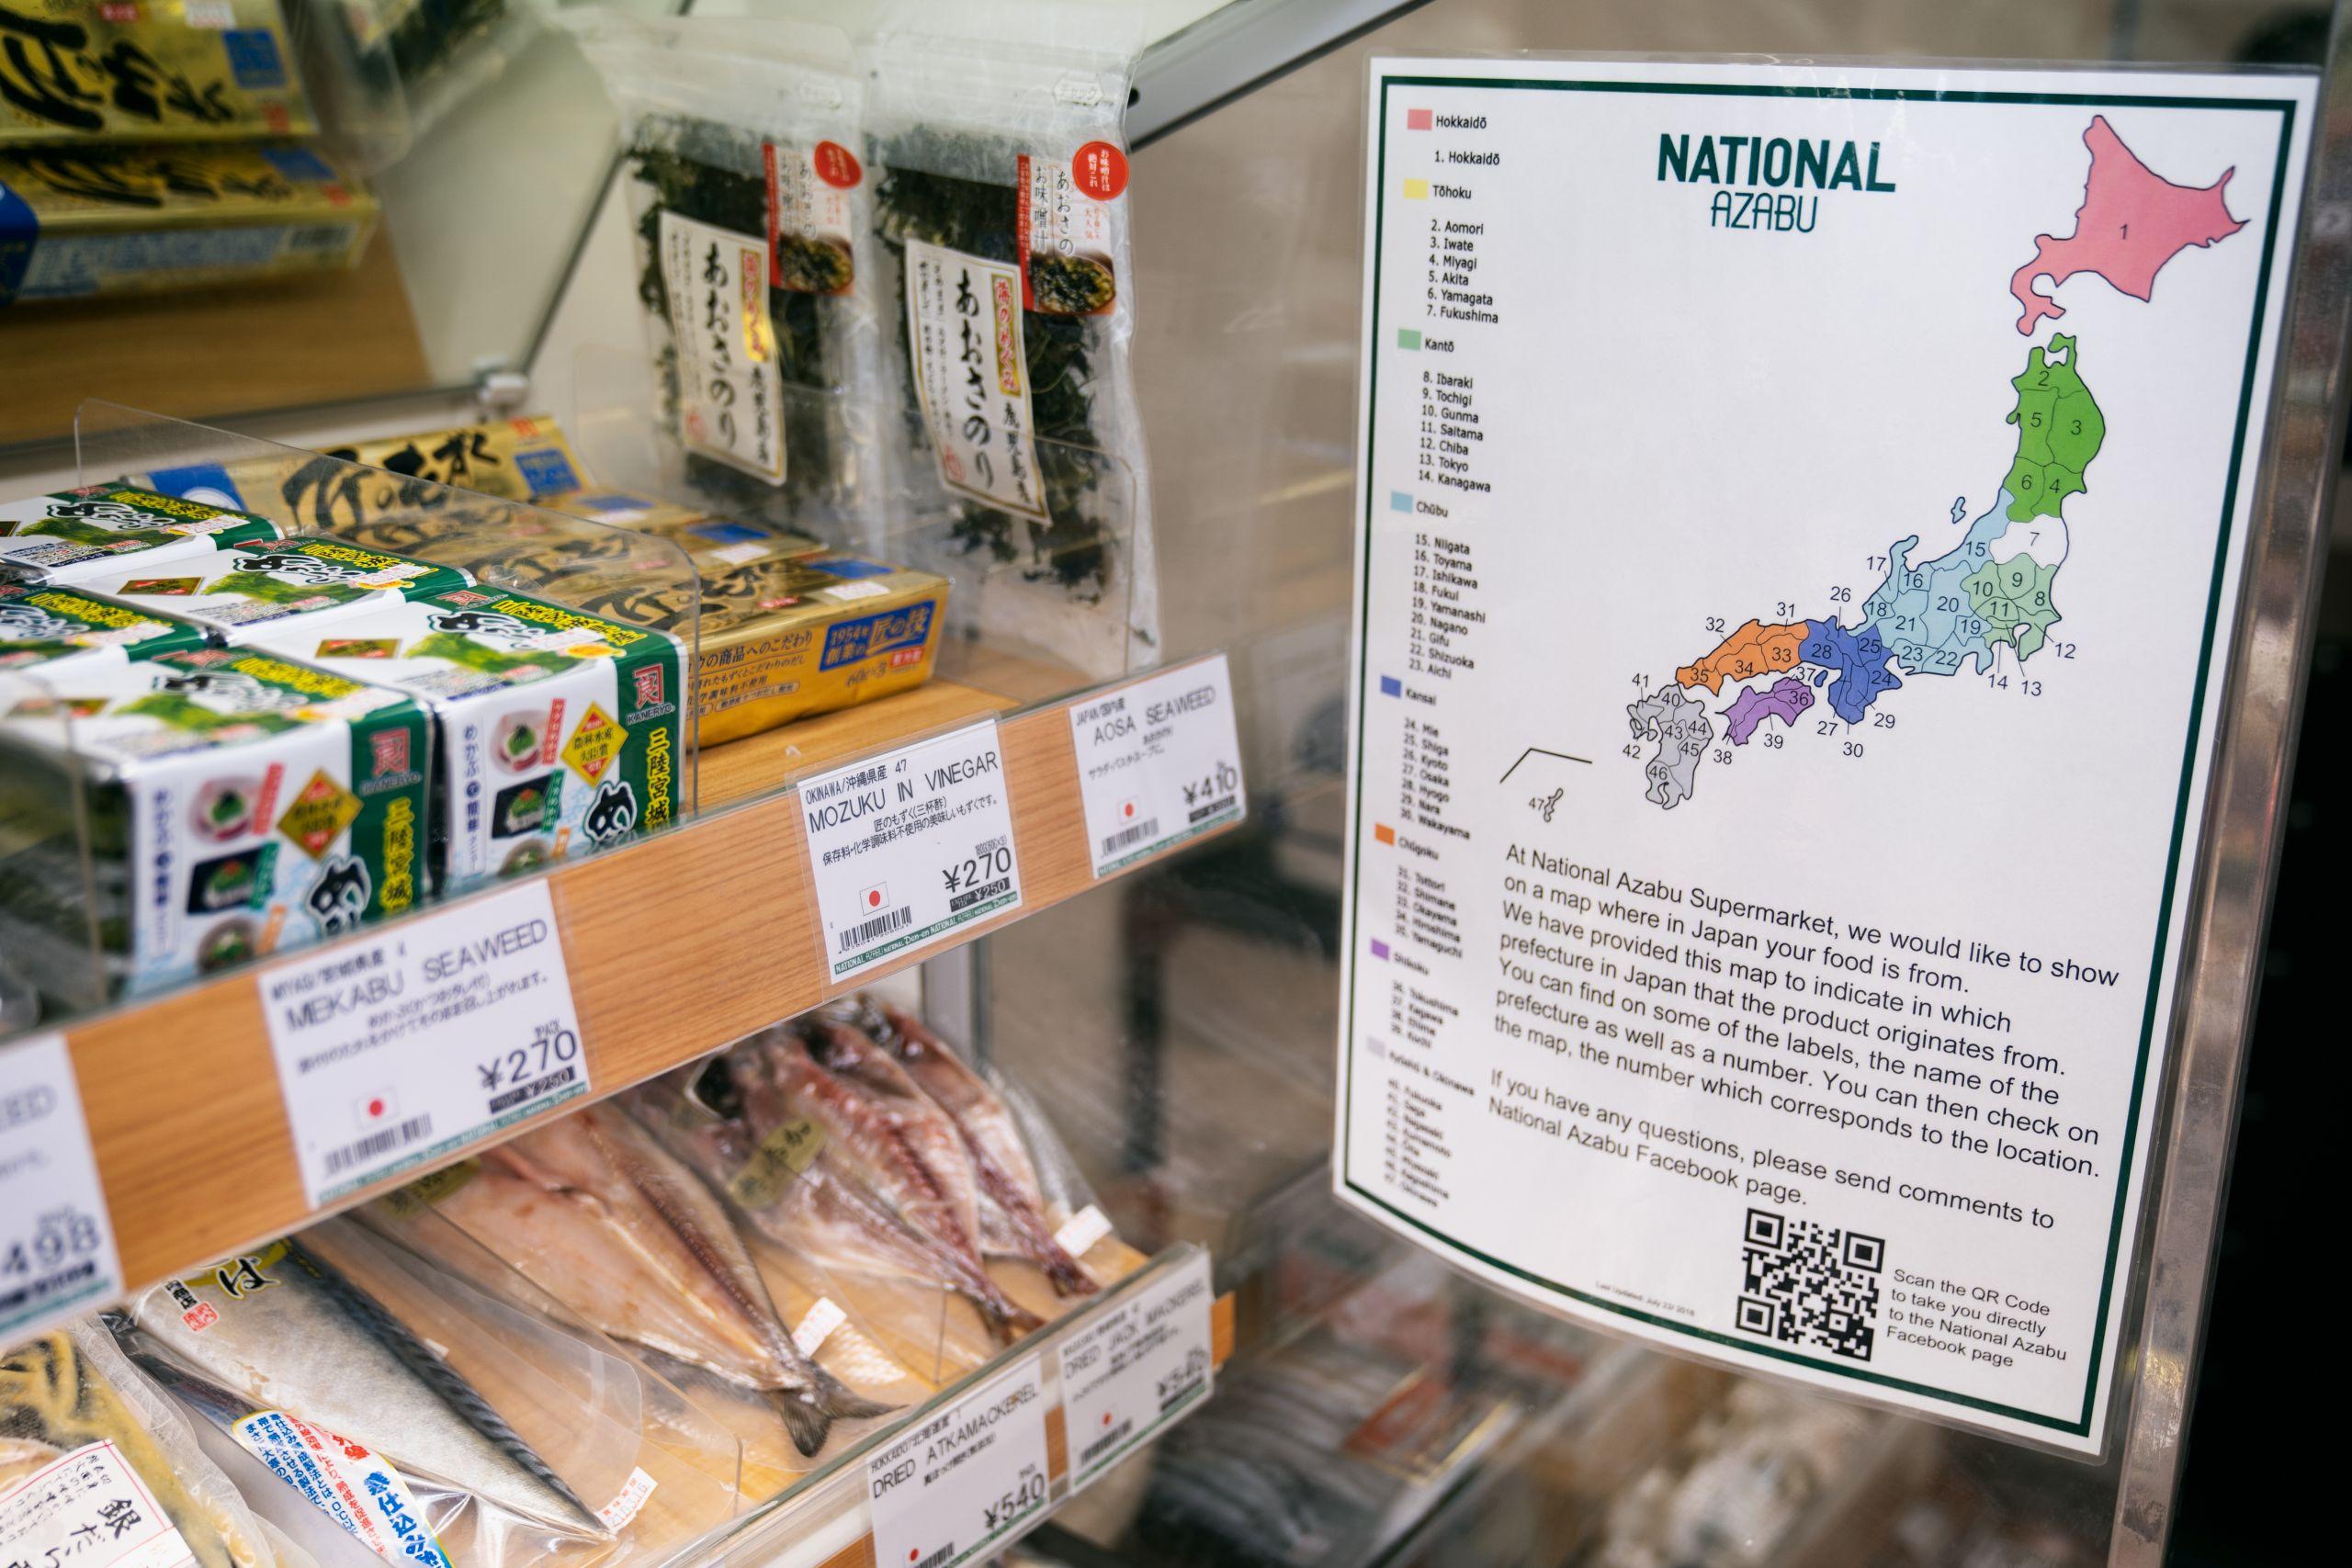 national-azabu-supermarket-tokyo-japan-metropolis-magazine